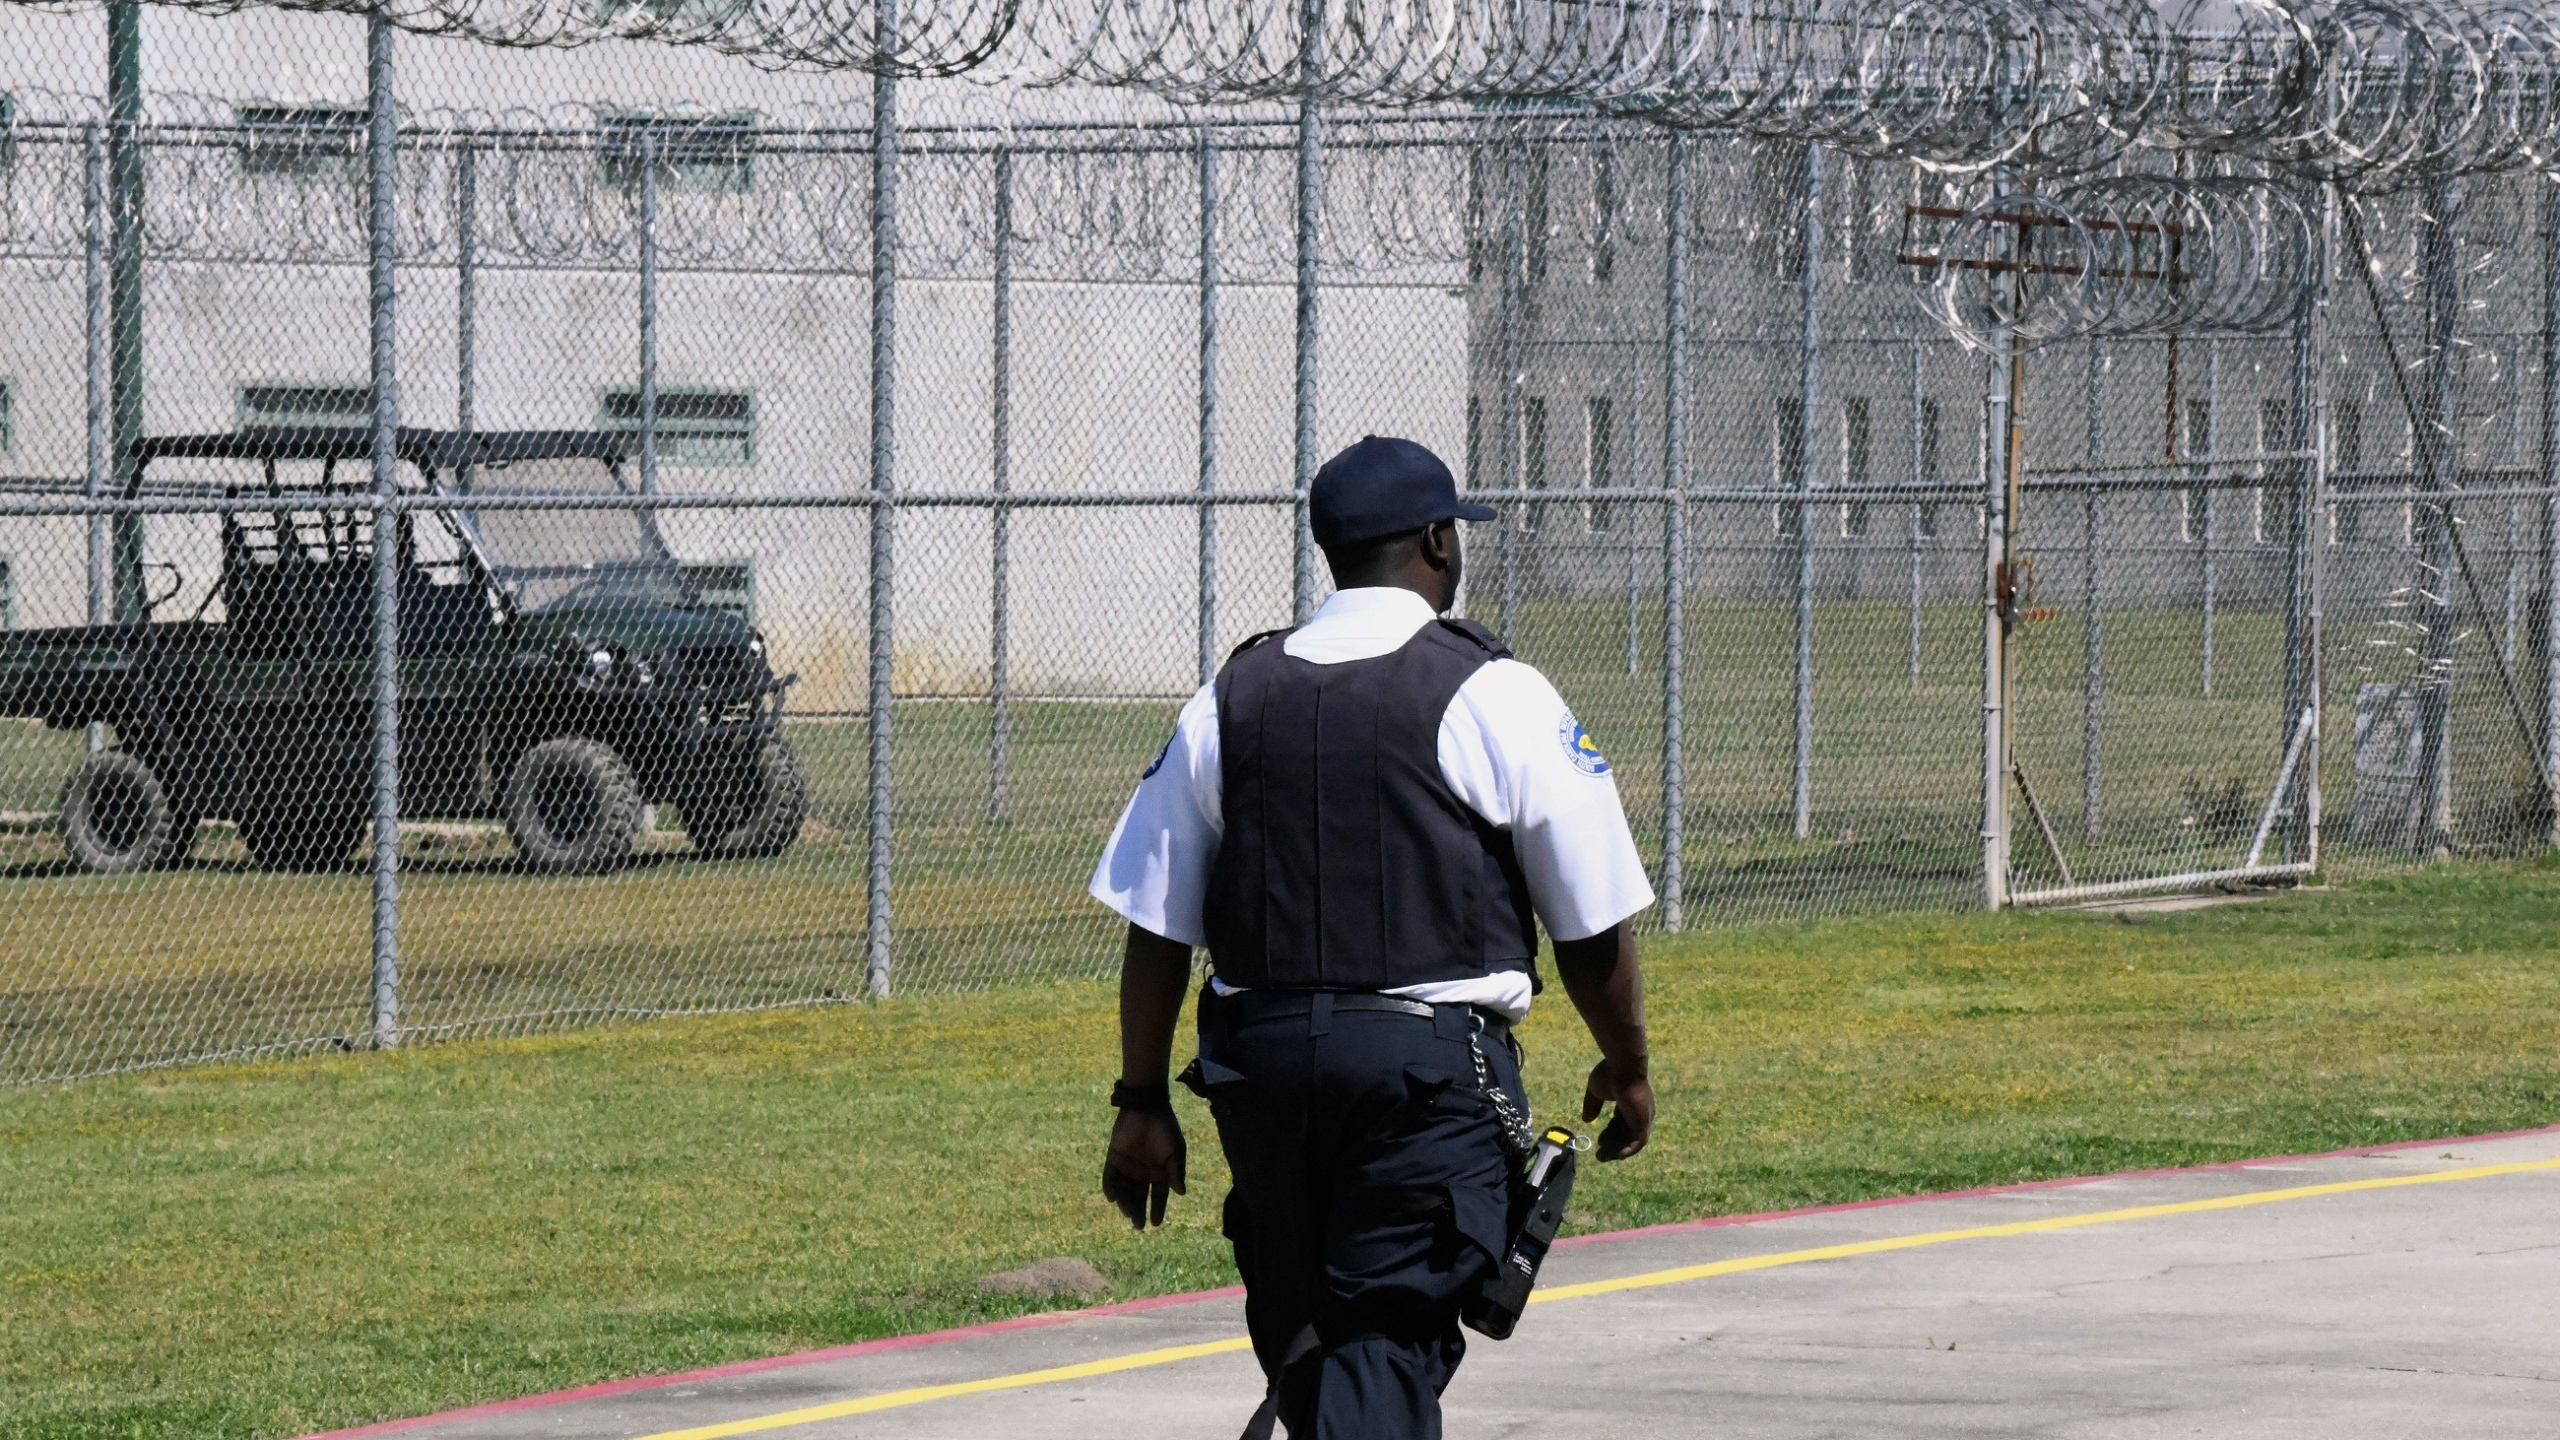 Prison_Riot_South_Carolina_27257-159532.jpg64107064